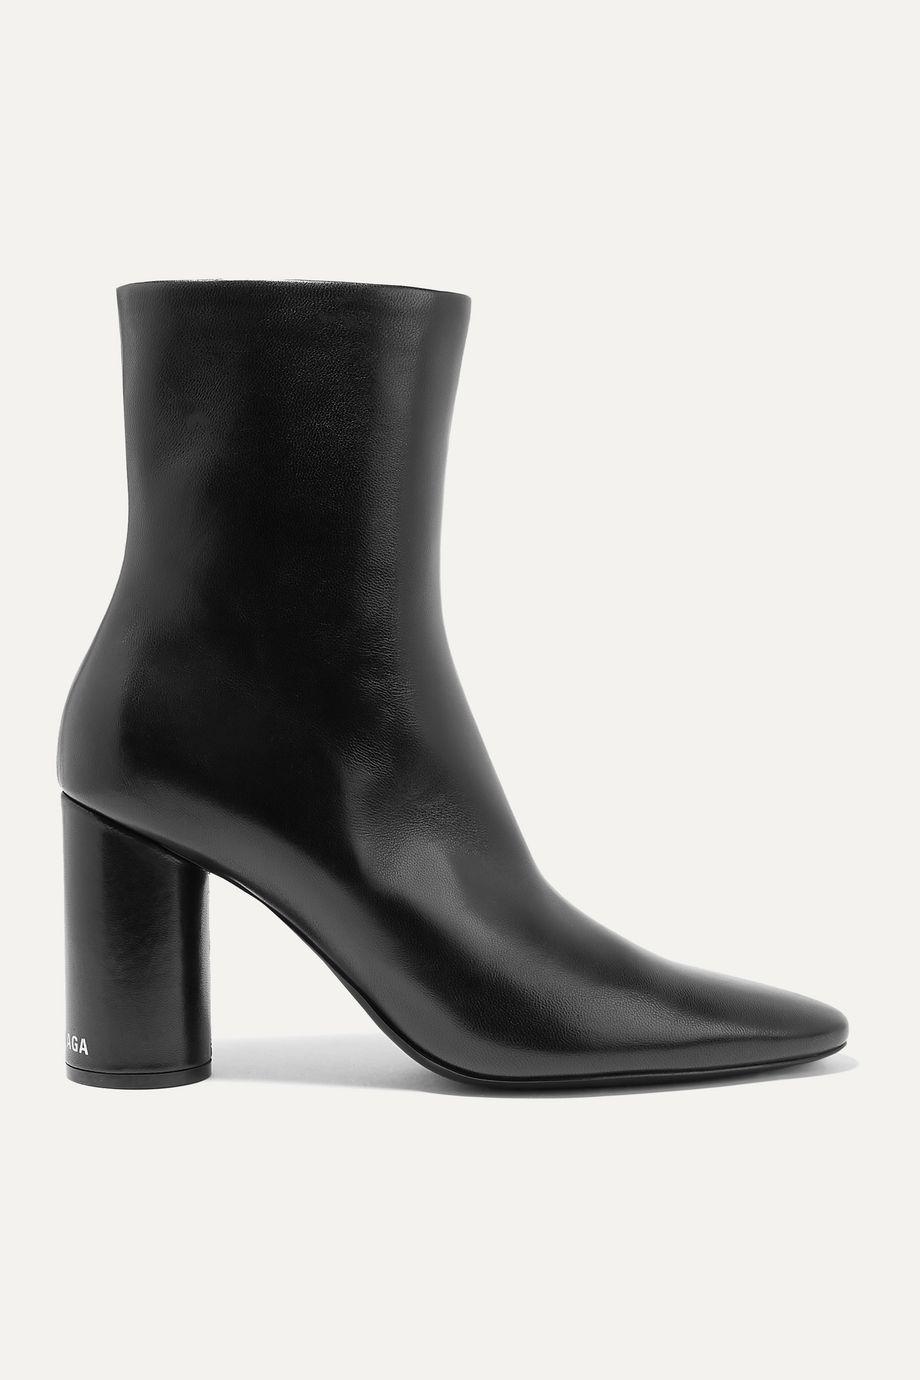 Balenciaga Oval leather ankle boots